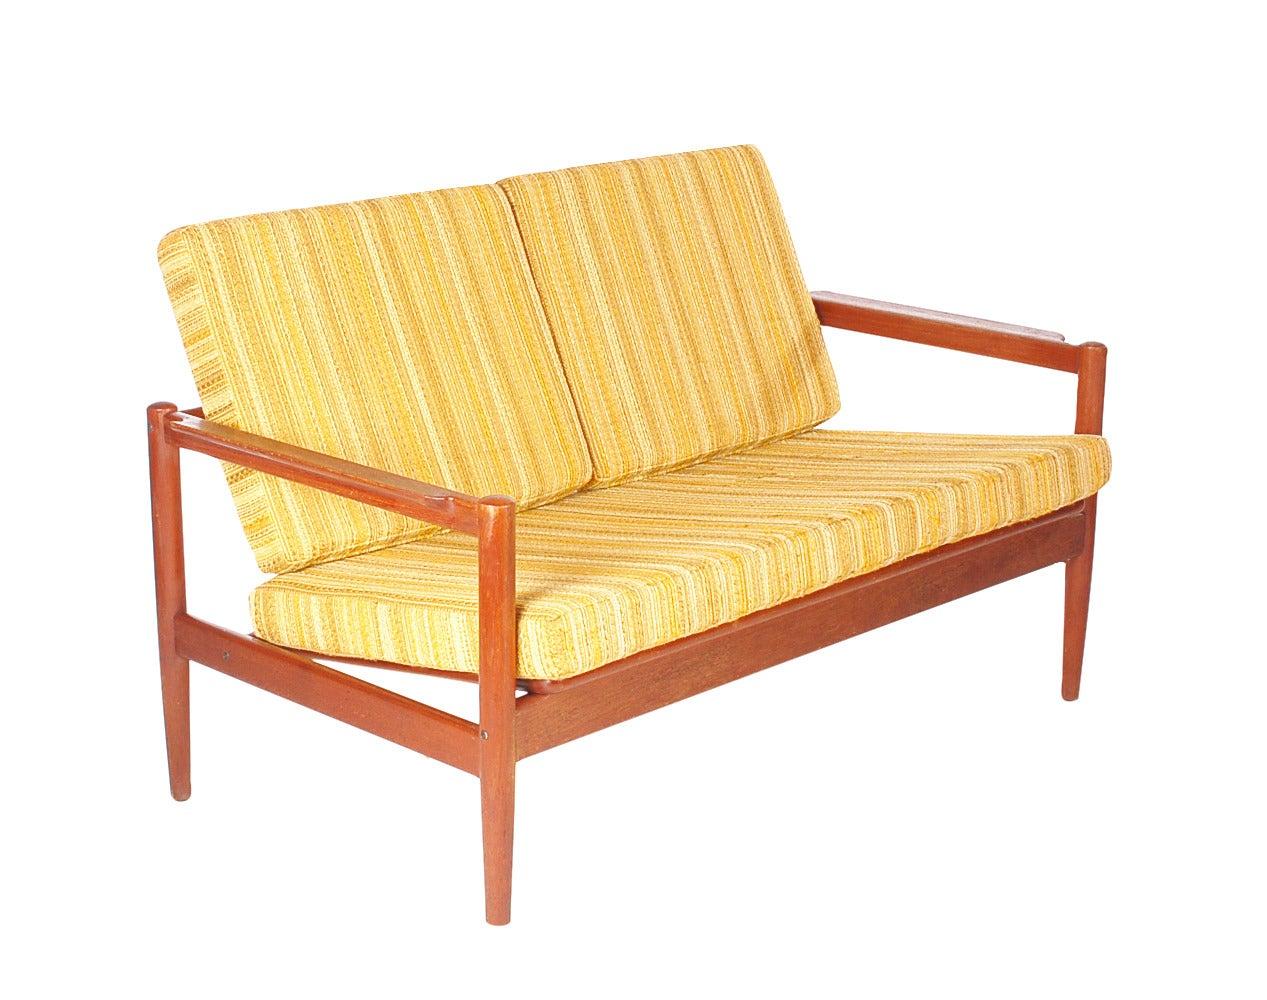 Danish modern teak sofa by borge jensen settee at 1stdibs for Danish modern settee